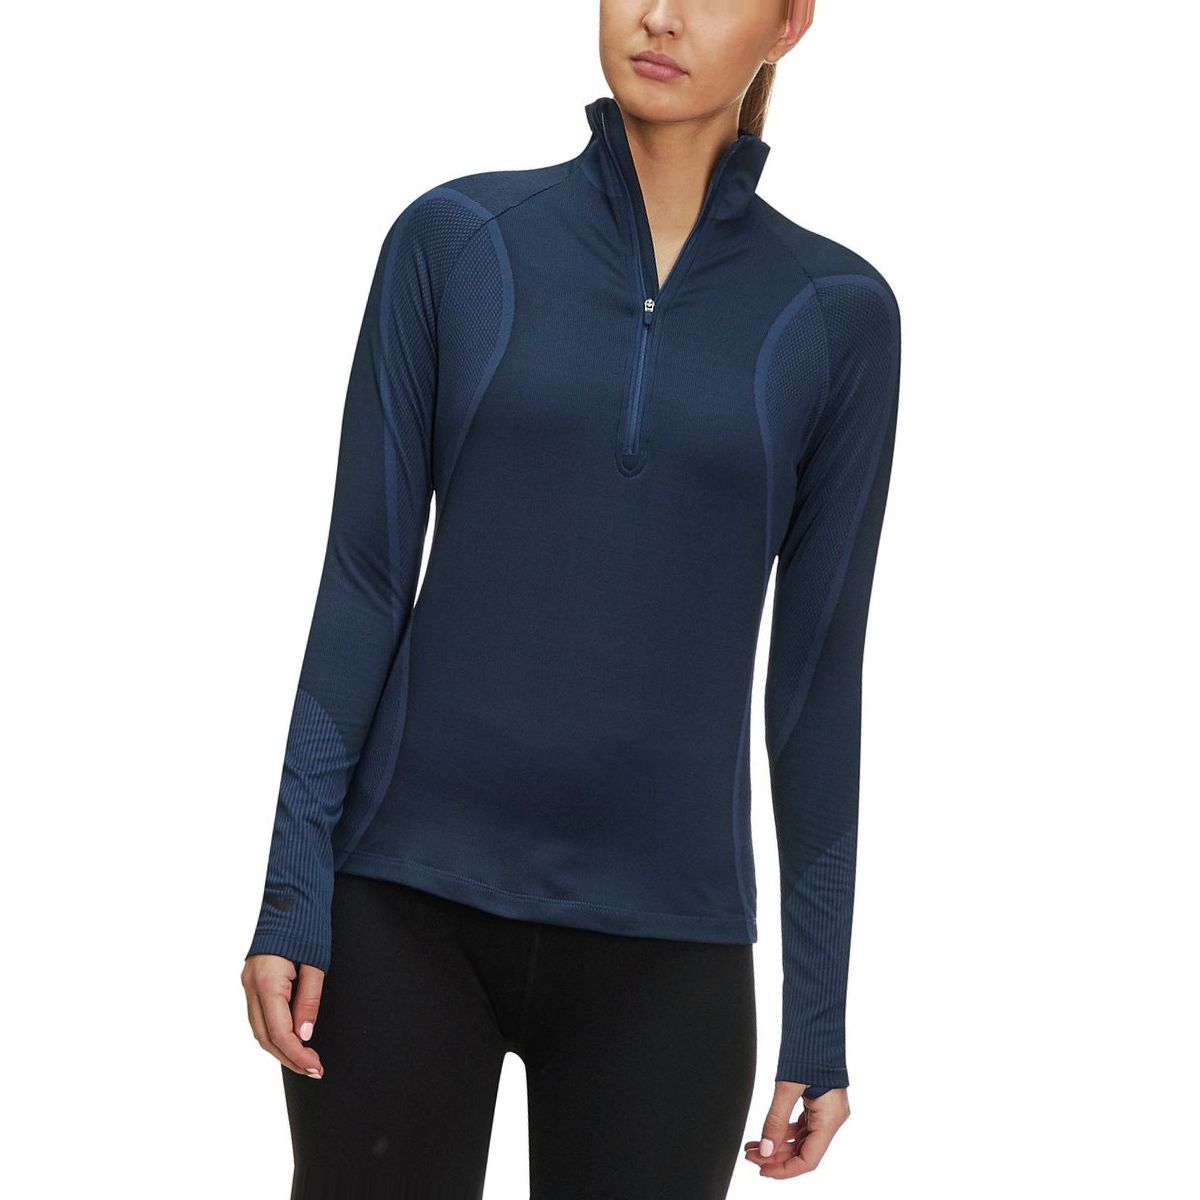 Nike Pro HyperWarm Long-Sleeve 1/2-Zip Top - Women's